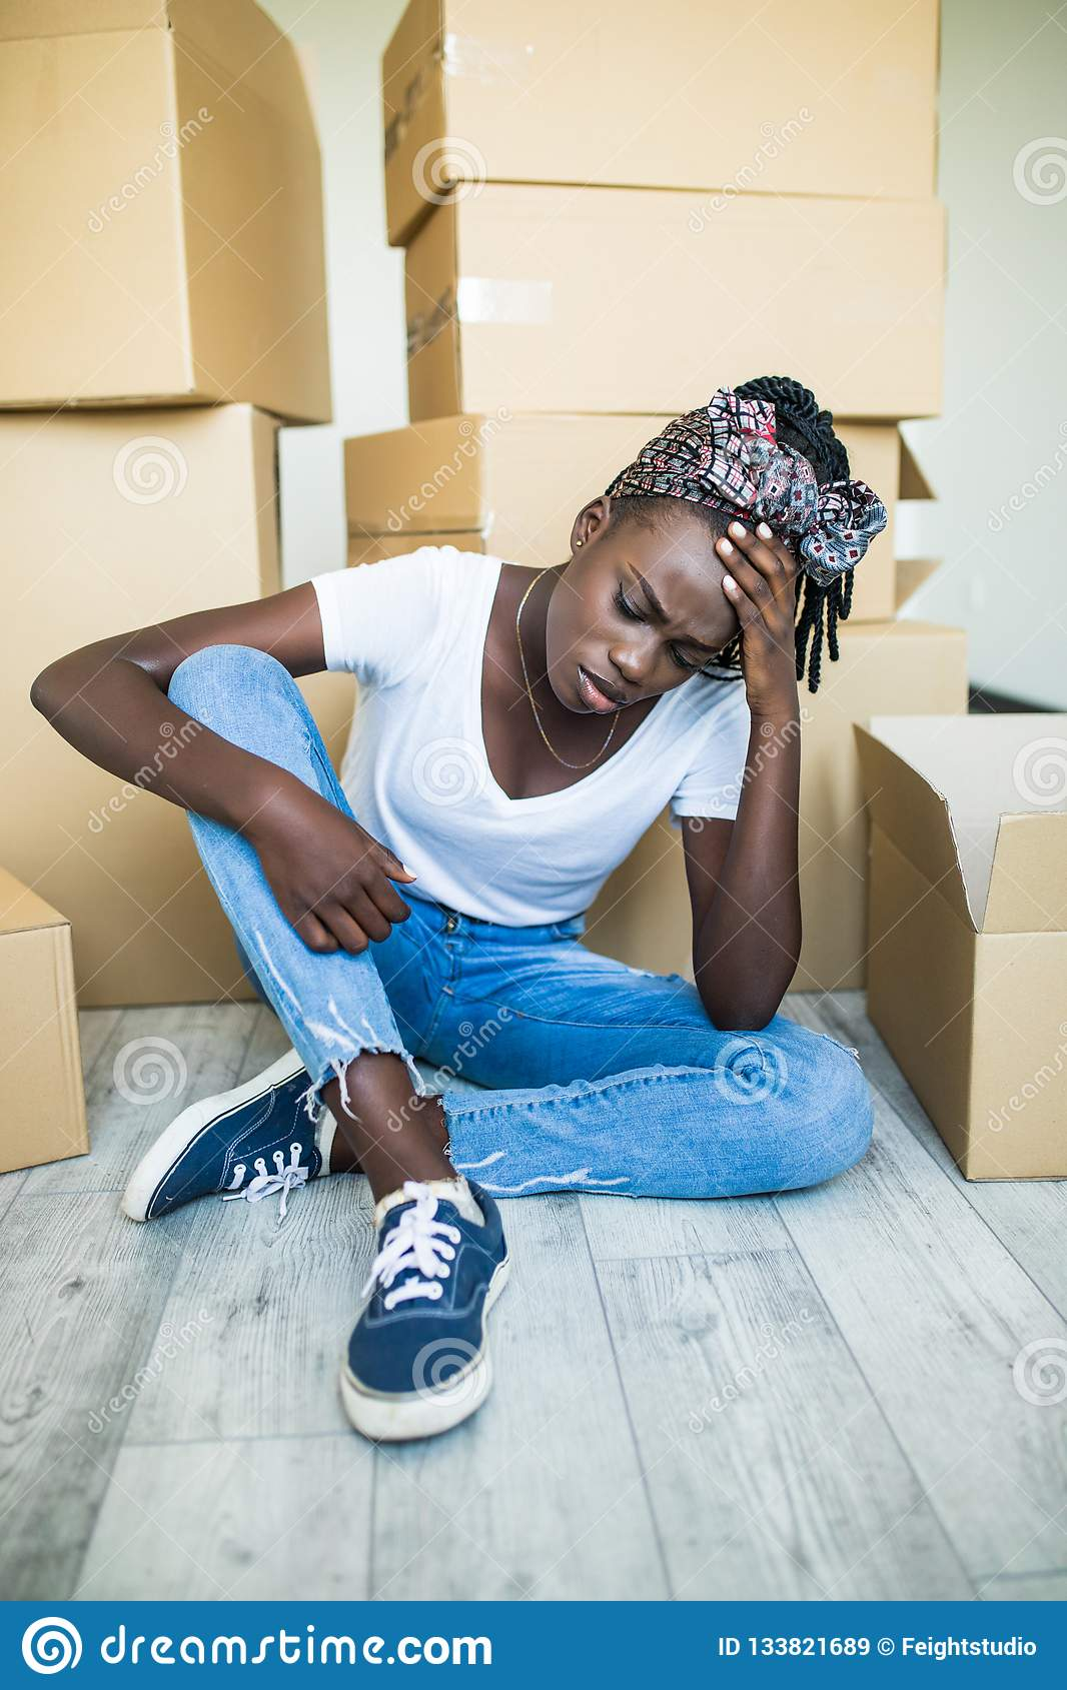 Ledsen afrikansk kvinna som unlimitedly ?r lycklig p? grund av att flytta det nya huset av hennes dr?m som sitter p? golvet med m